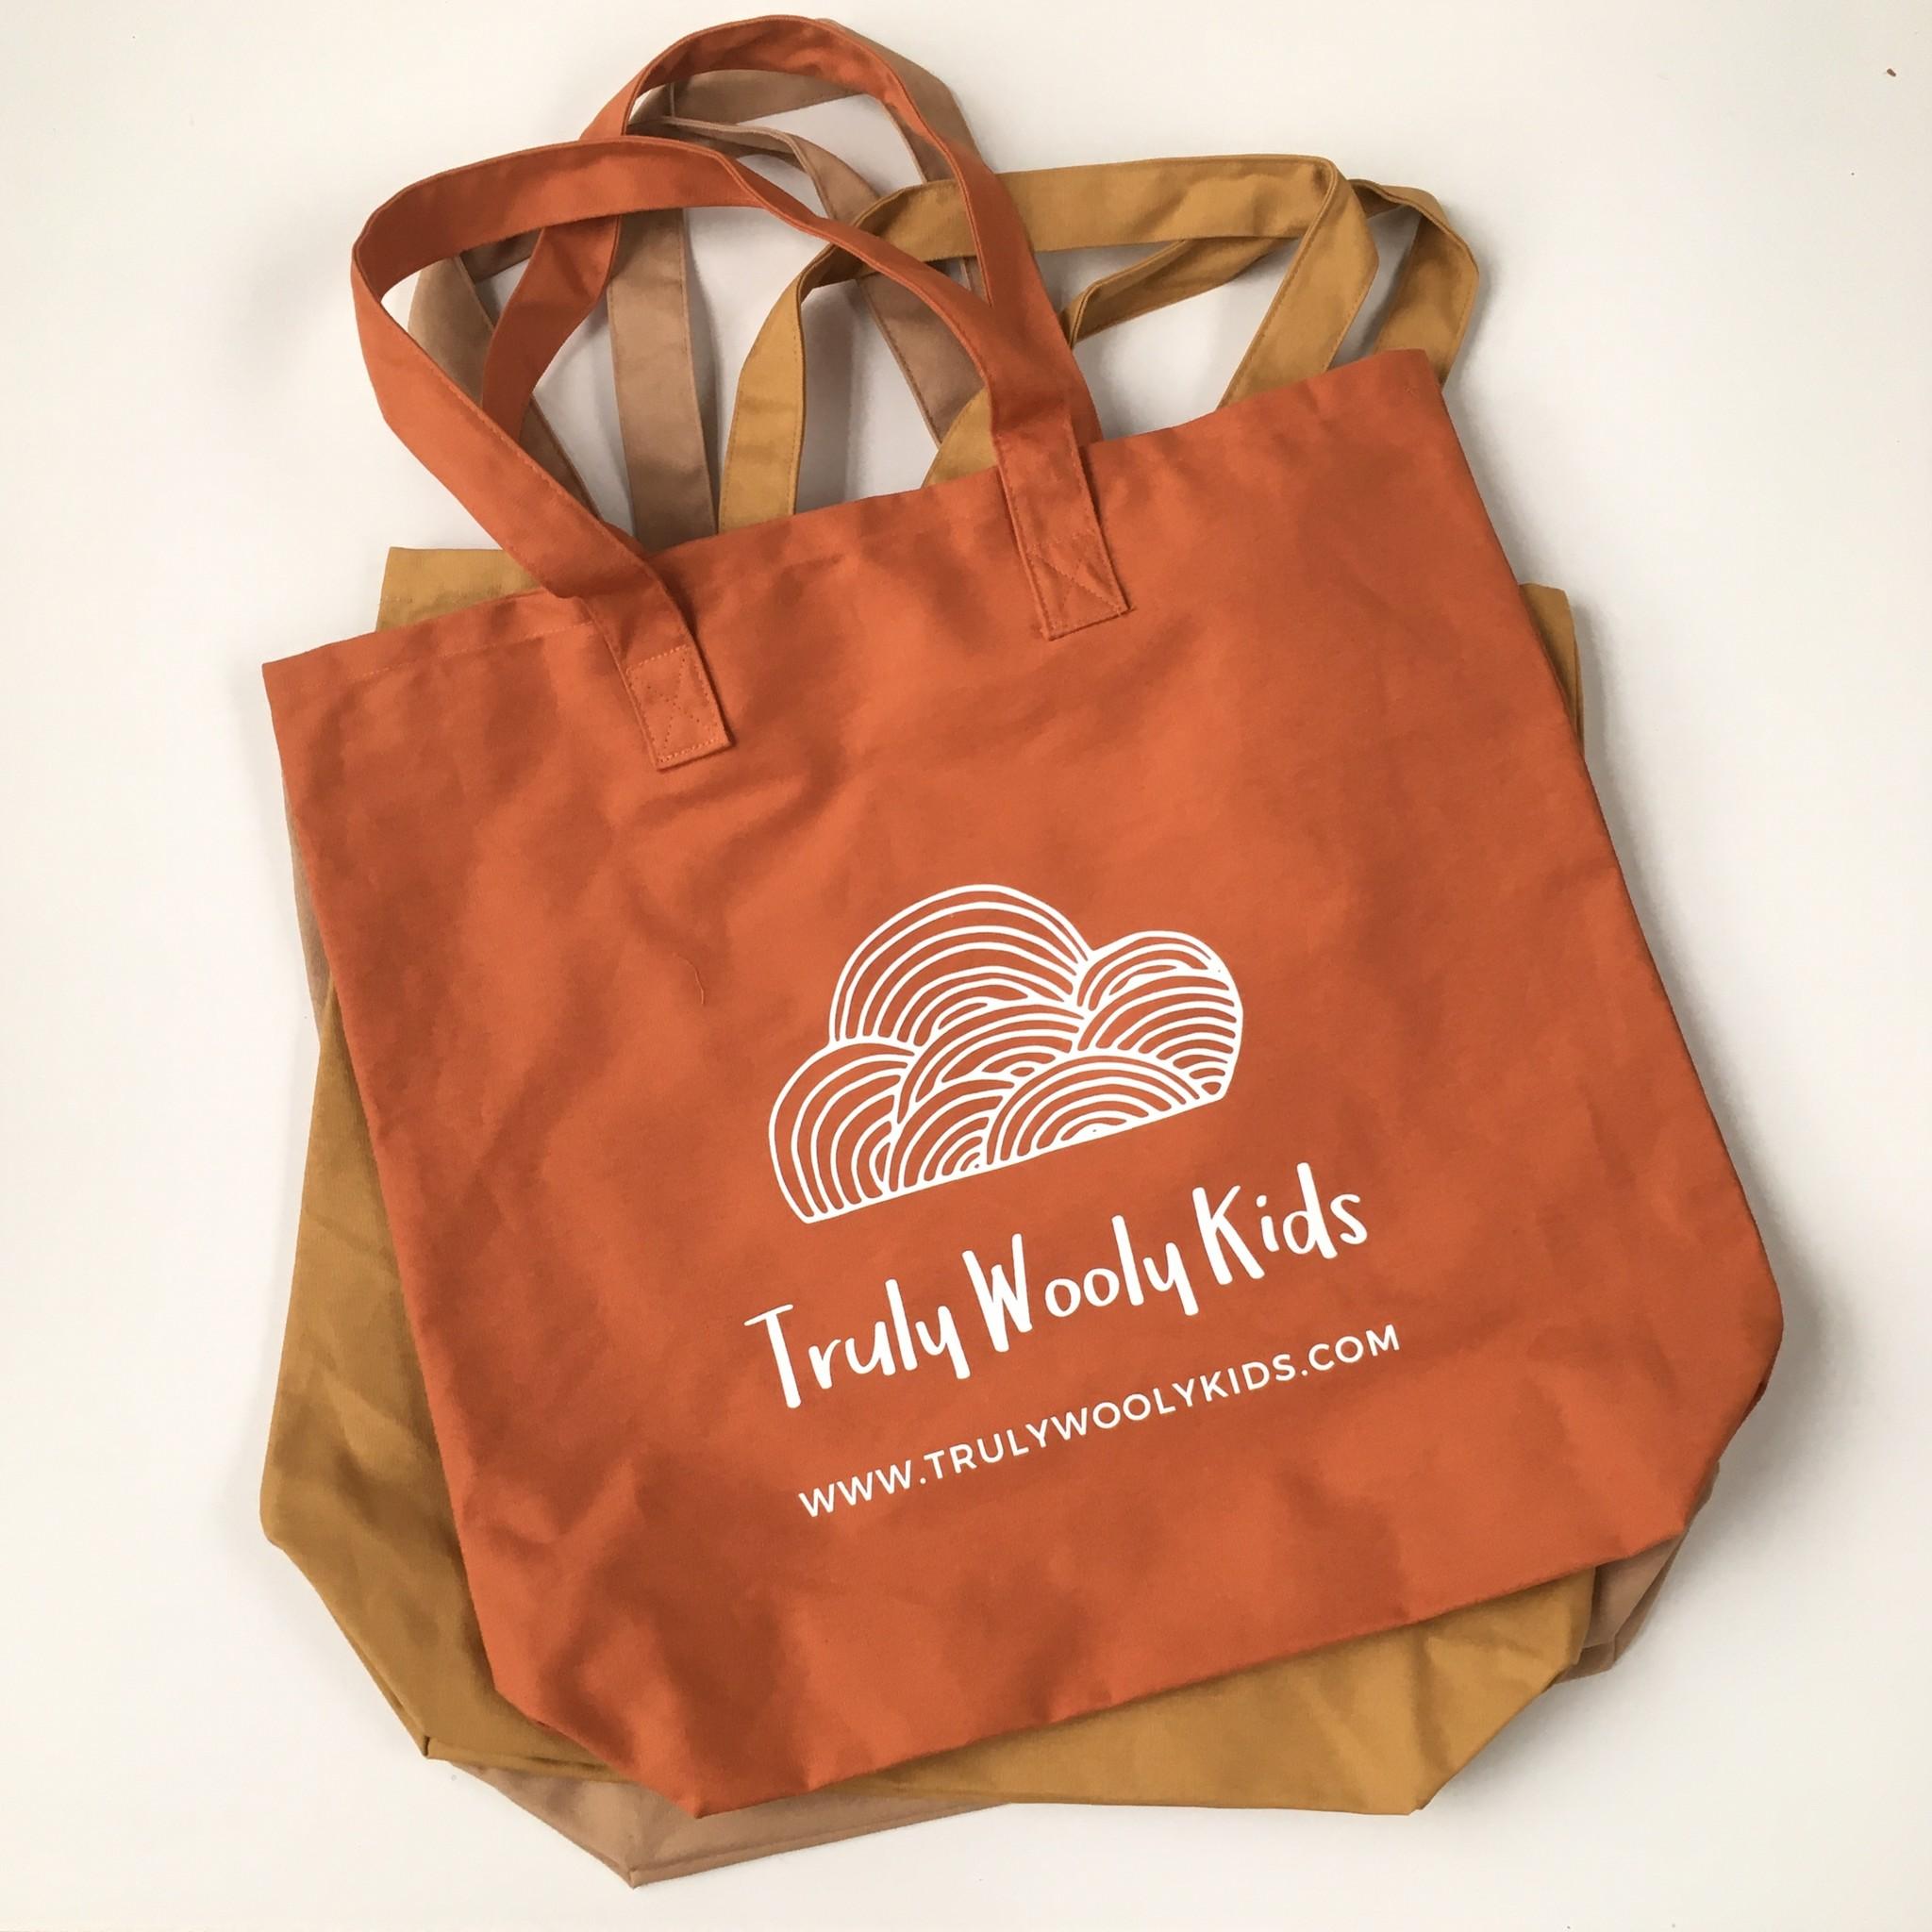 Truly Wooly Kids Truly Wooly Kids - XXL canvas shopper - 100% katoen - brick